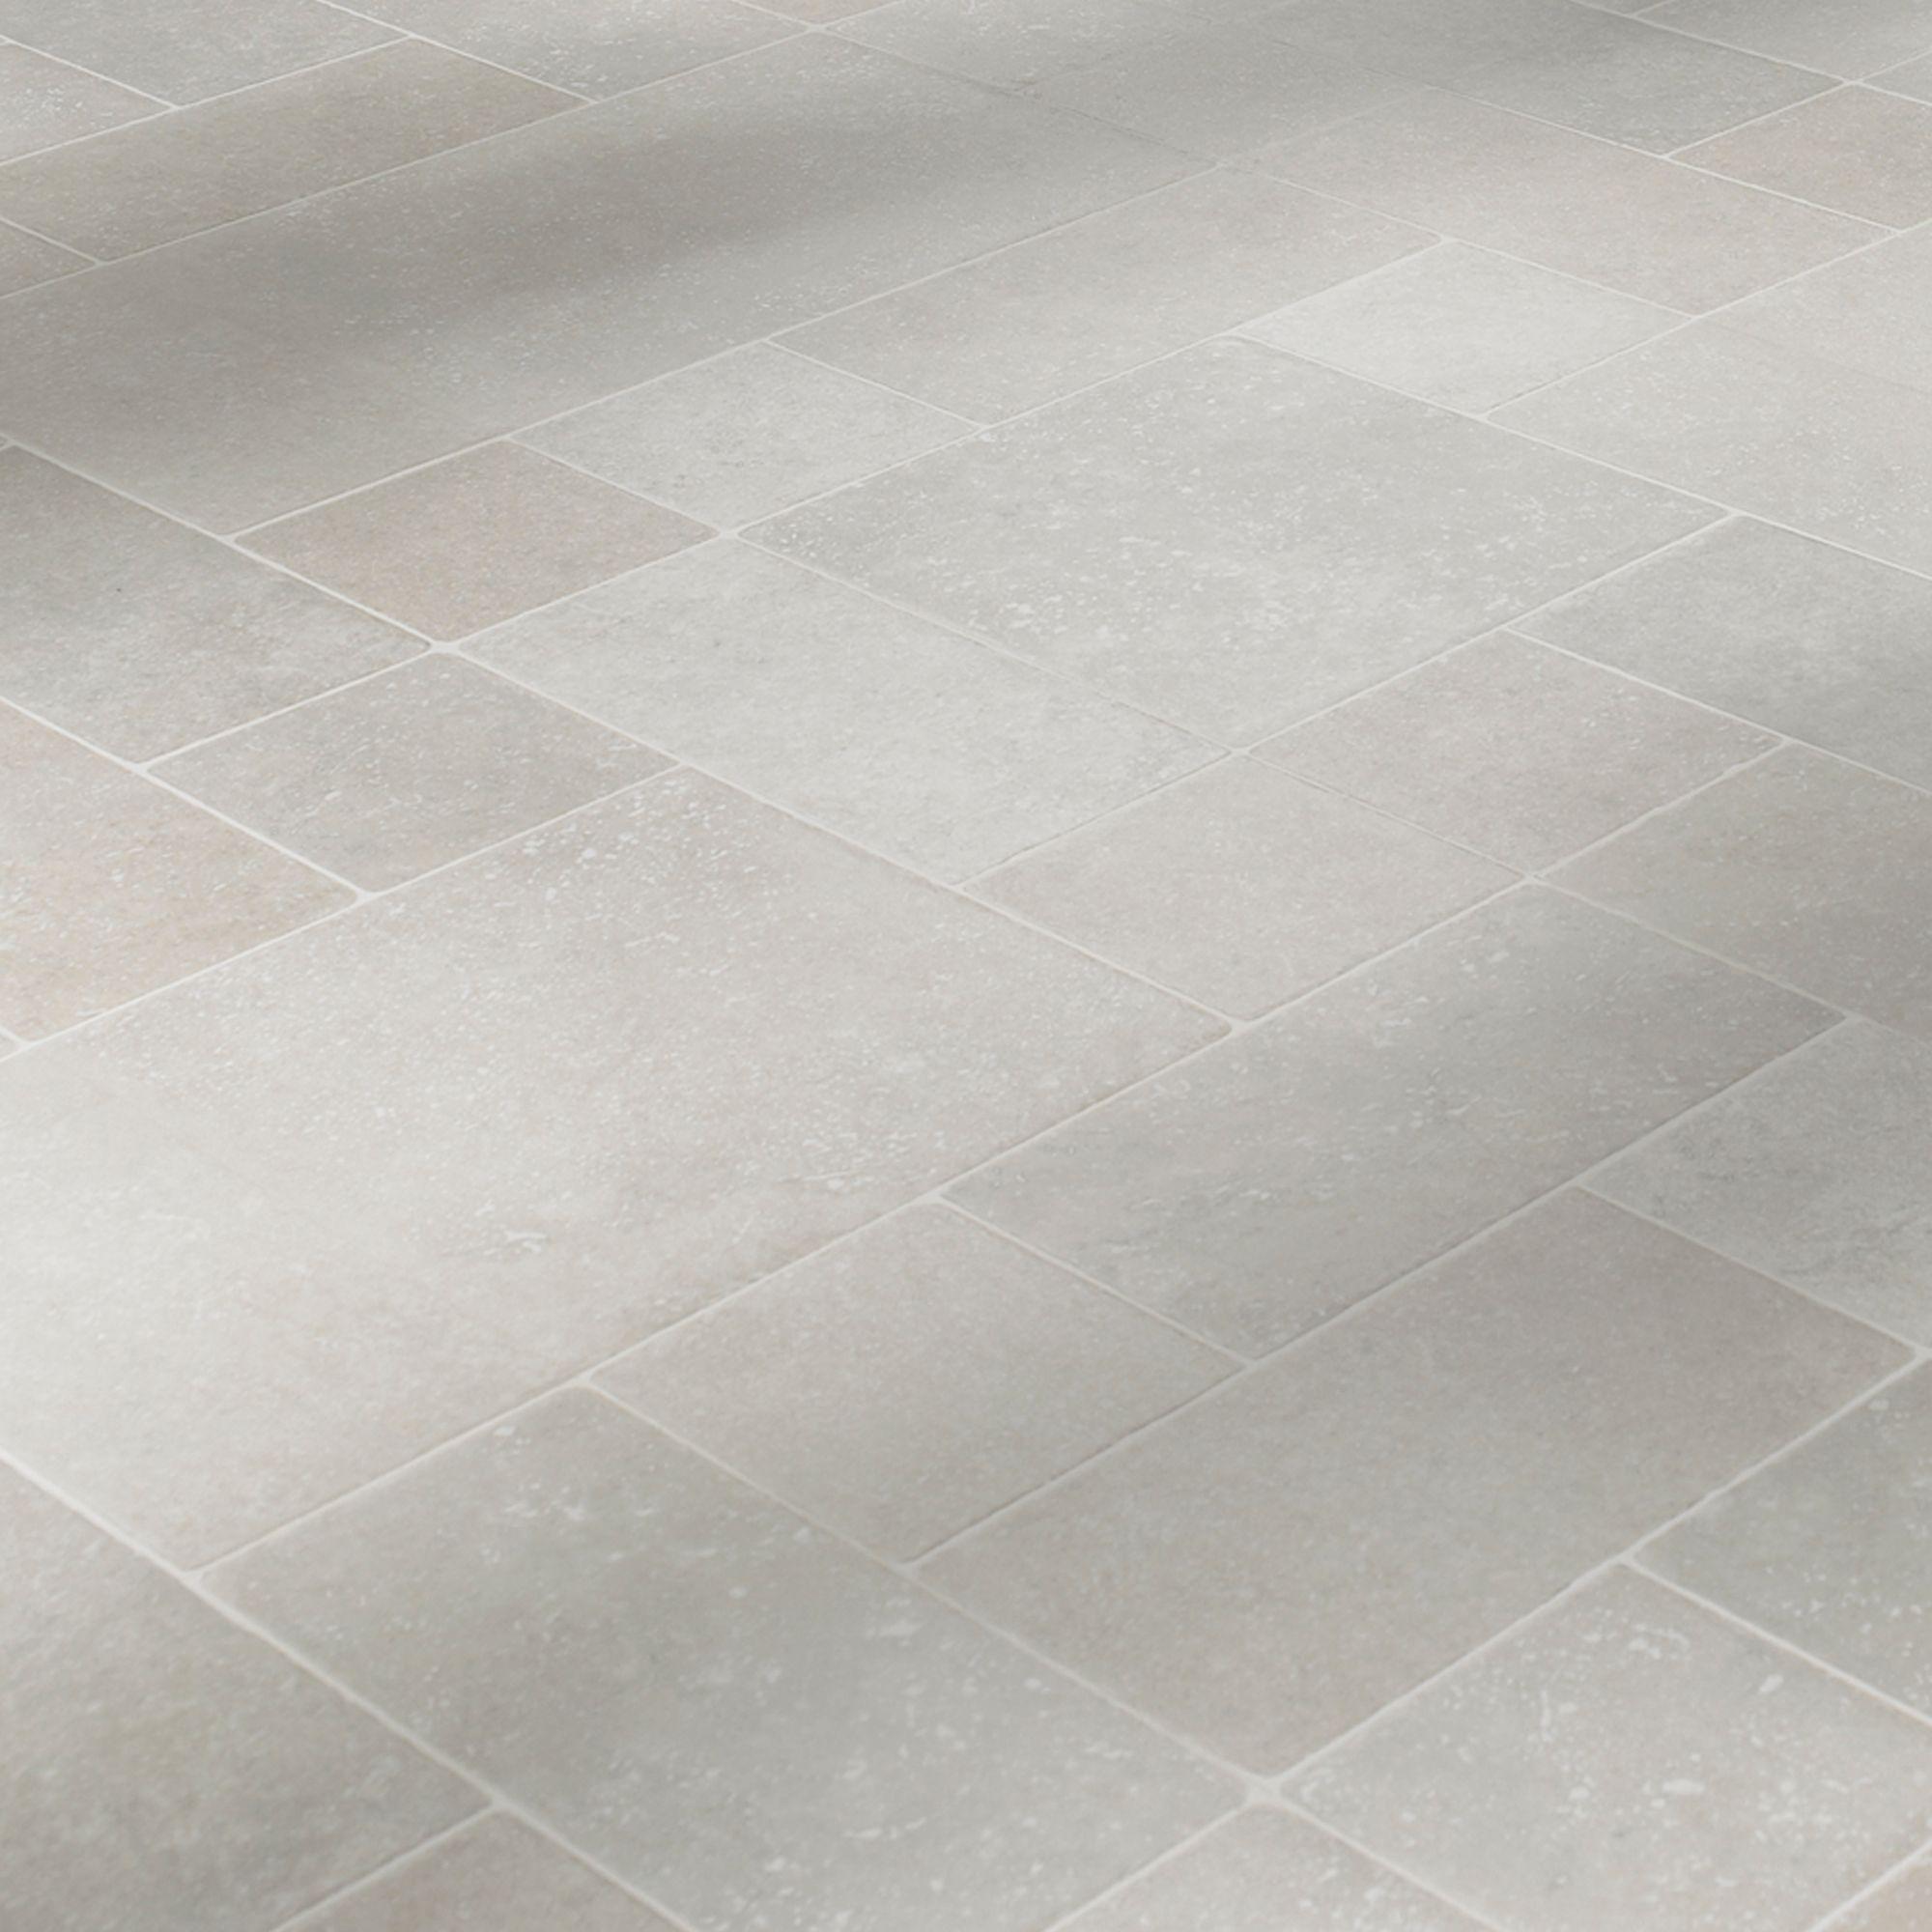 laminate flooring in kitchen Barbarita Limestone Effect Laminate Flooring 1 86 m Pack